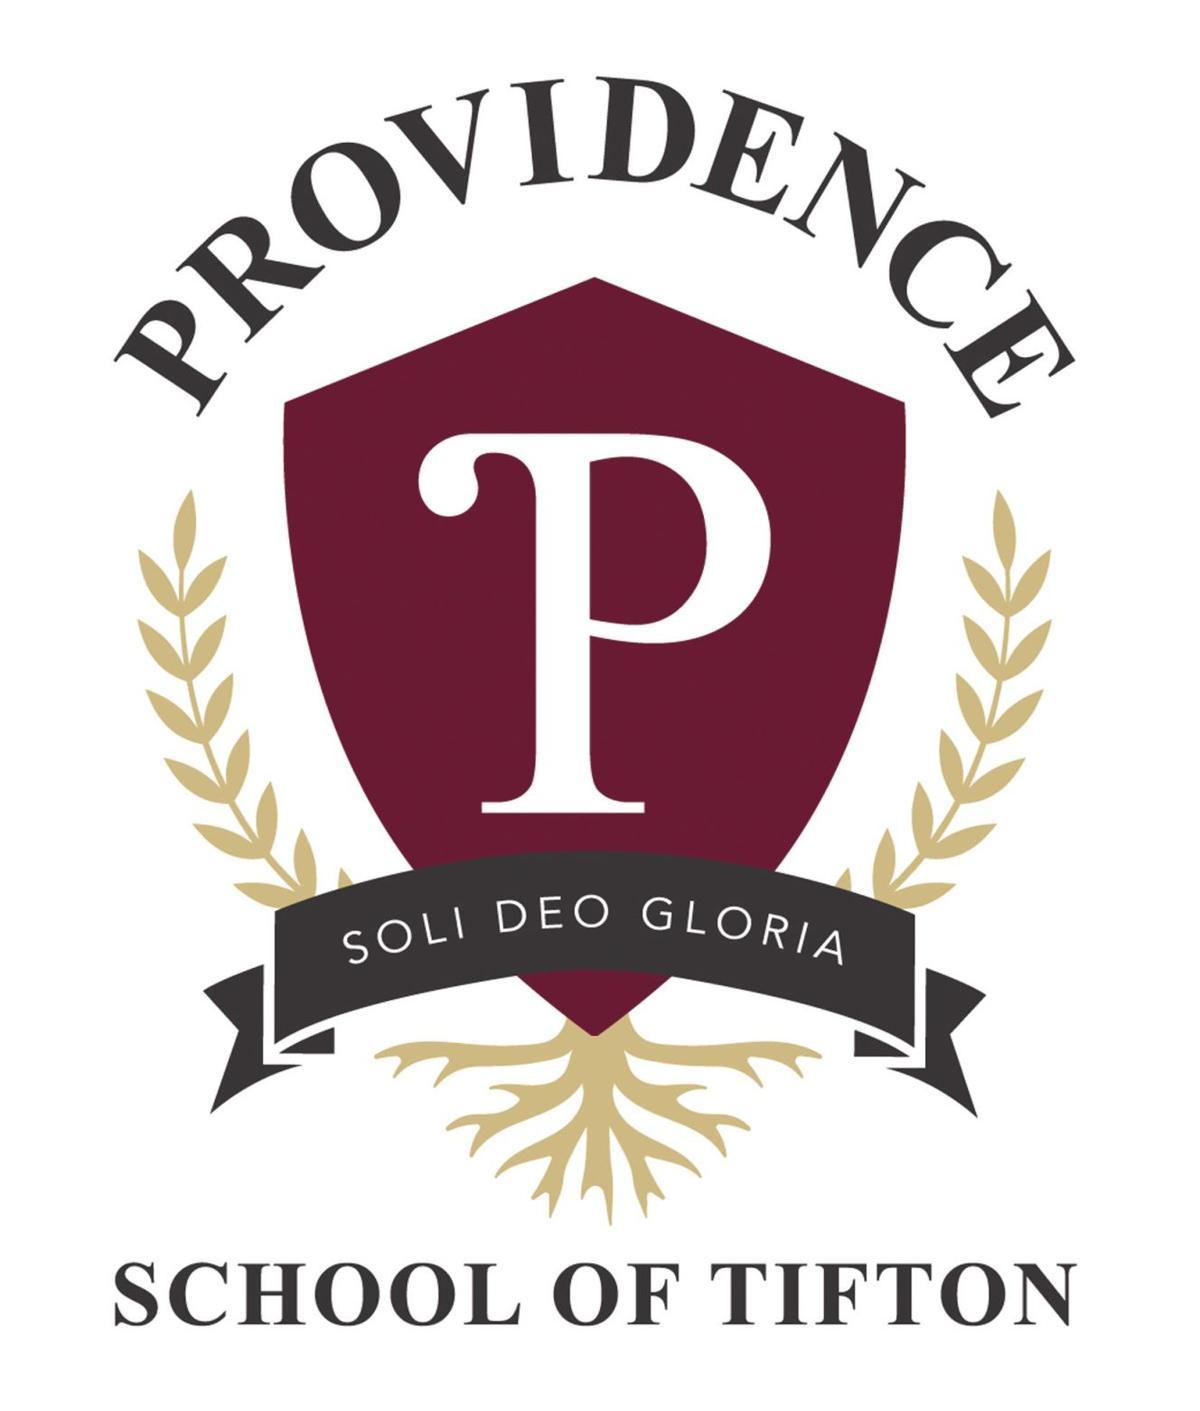 The Providence School of Tifton logo.